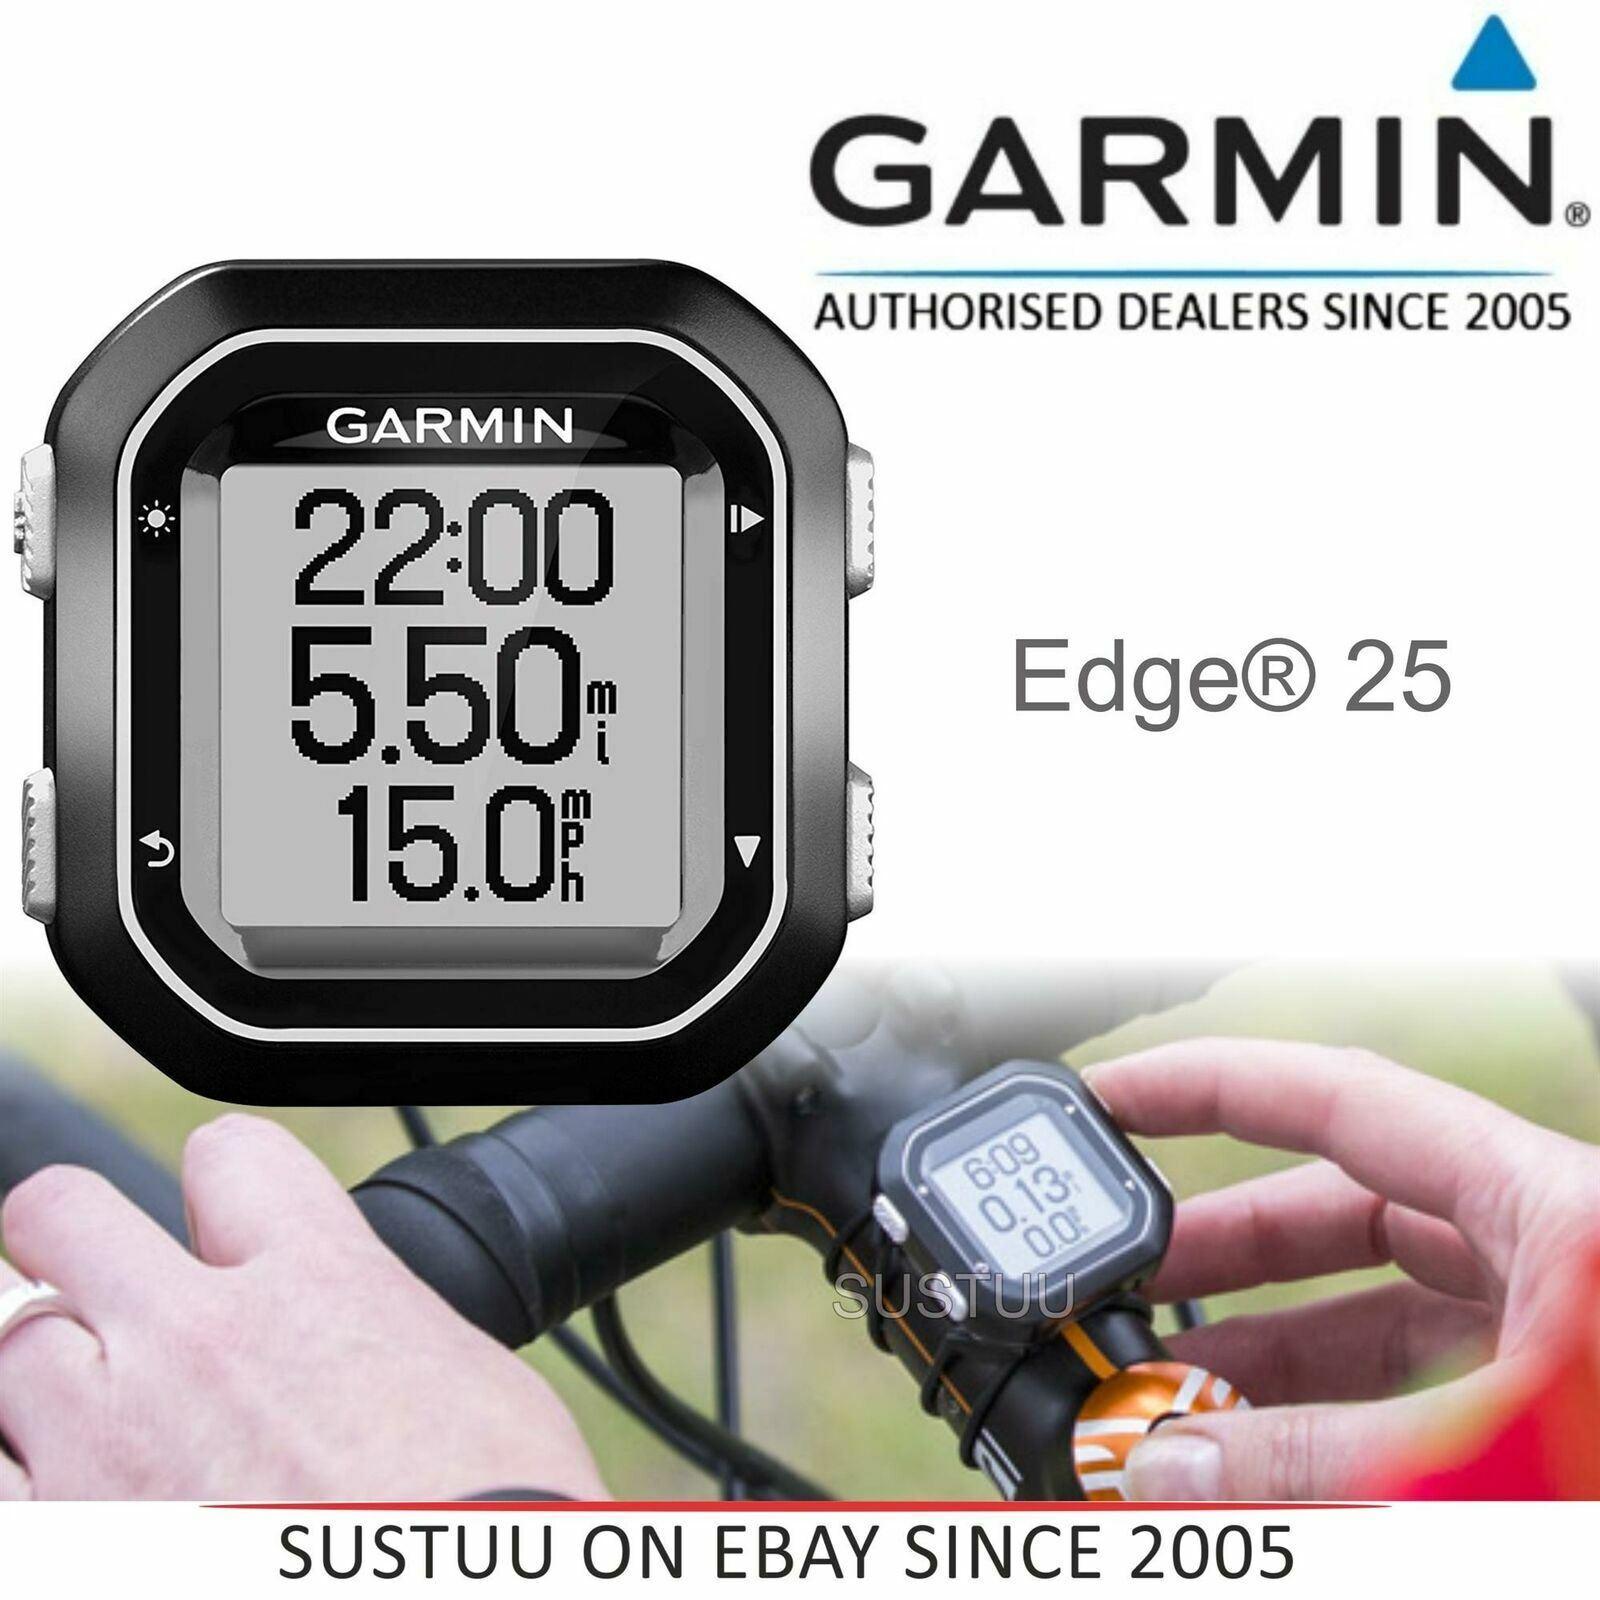 Garmin Edge 25 GPS Bike Cycling Computer│Live Tracking│GLONASS│Water-resistant